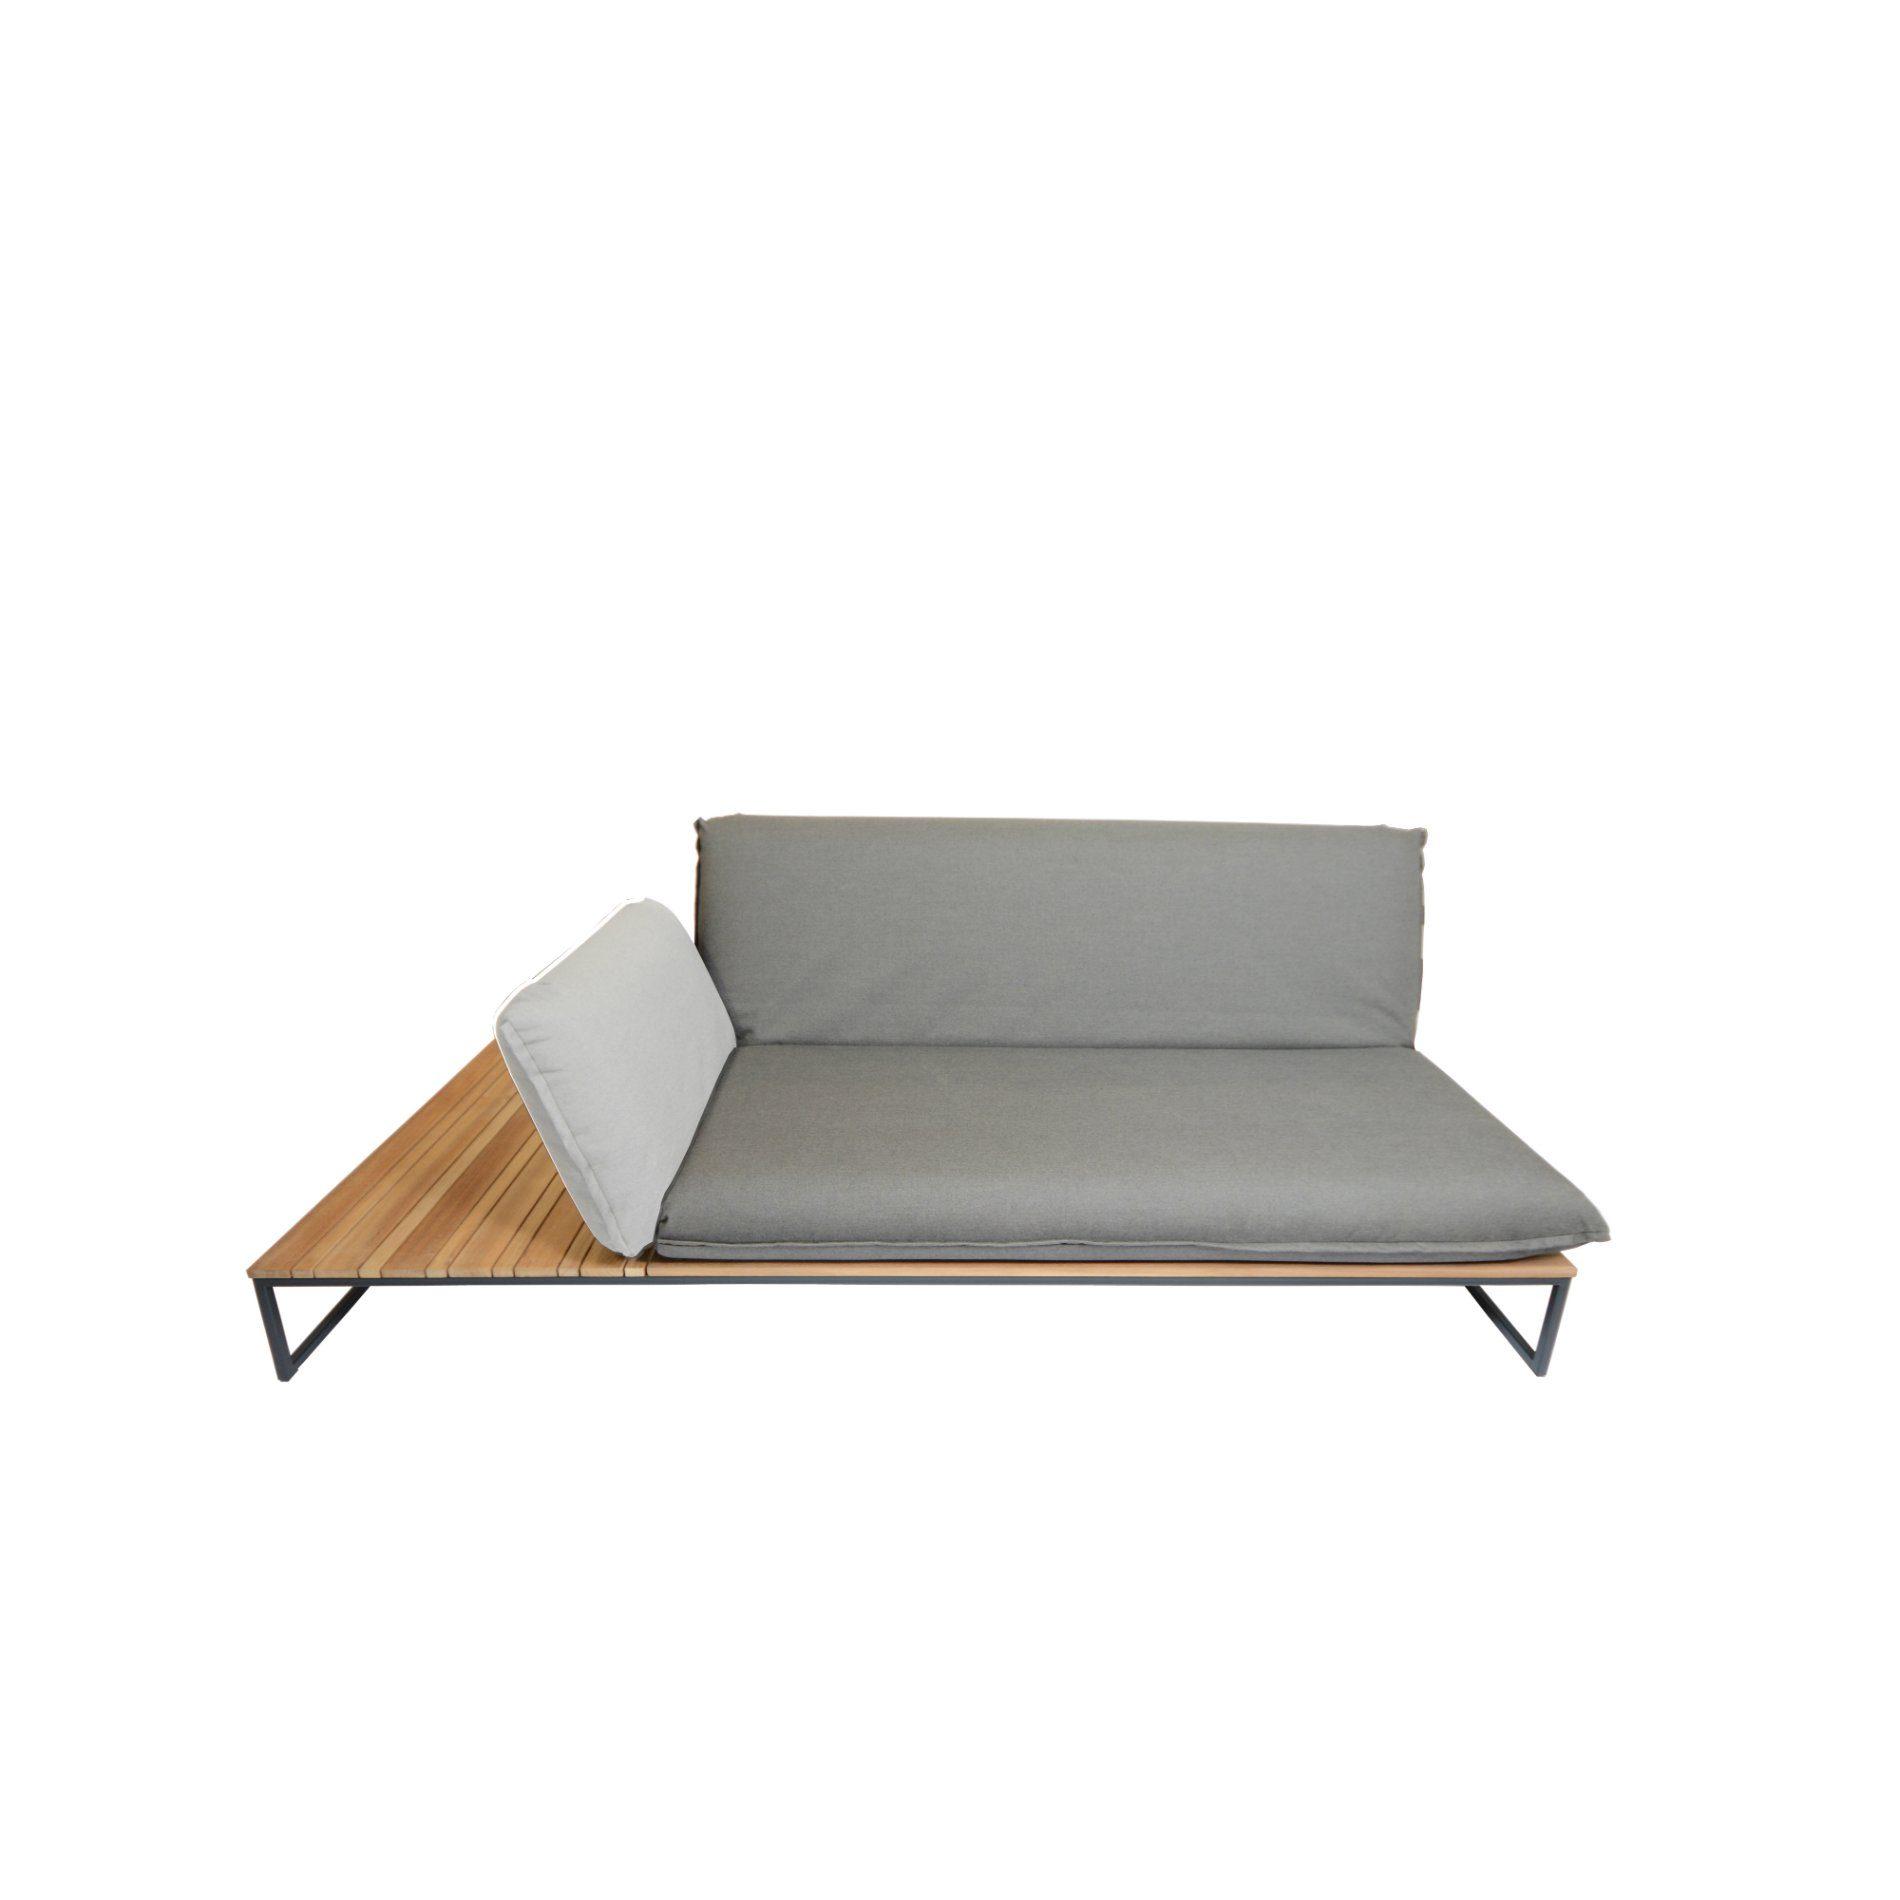 fischer m bel flora 2 sitzer loungesofa armlehne rechts. Black Bedroom Furniture Sets. Home Design Ideas